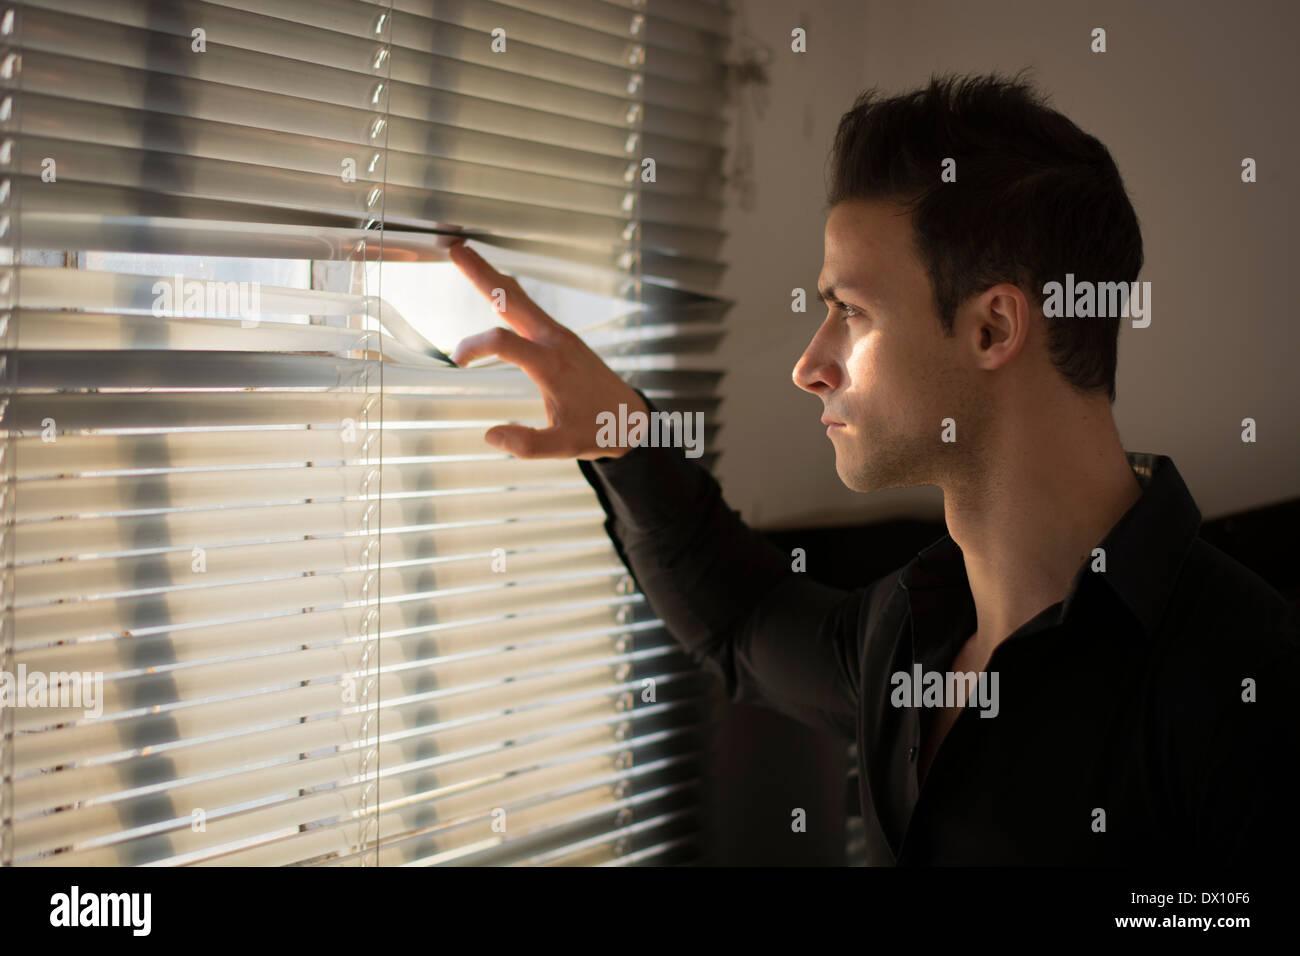 Profile of young man peeking through venetian blinds in a dark room - Stock Image